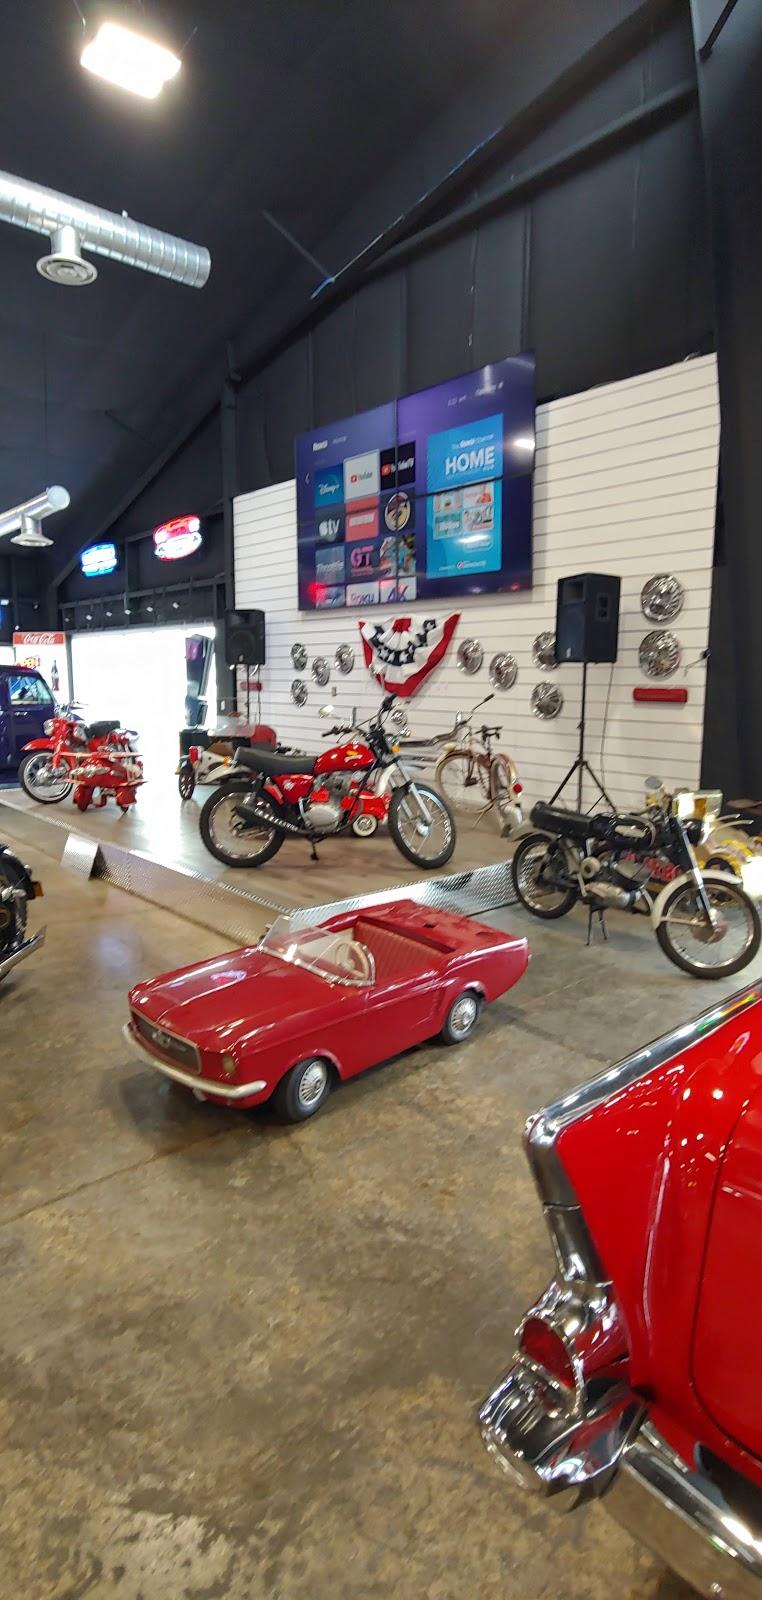 Dragers International Classic Sales - museum  | Photo 9 of 10 | Address: 1645 Walton Dr, Burlington, WA 98233, USA | Phone: (206) 533-9600